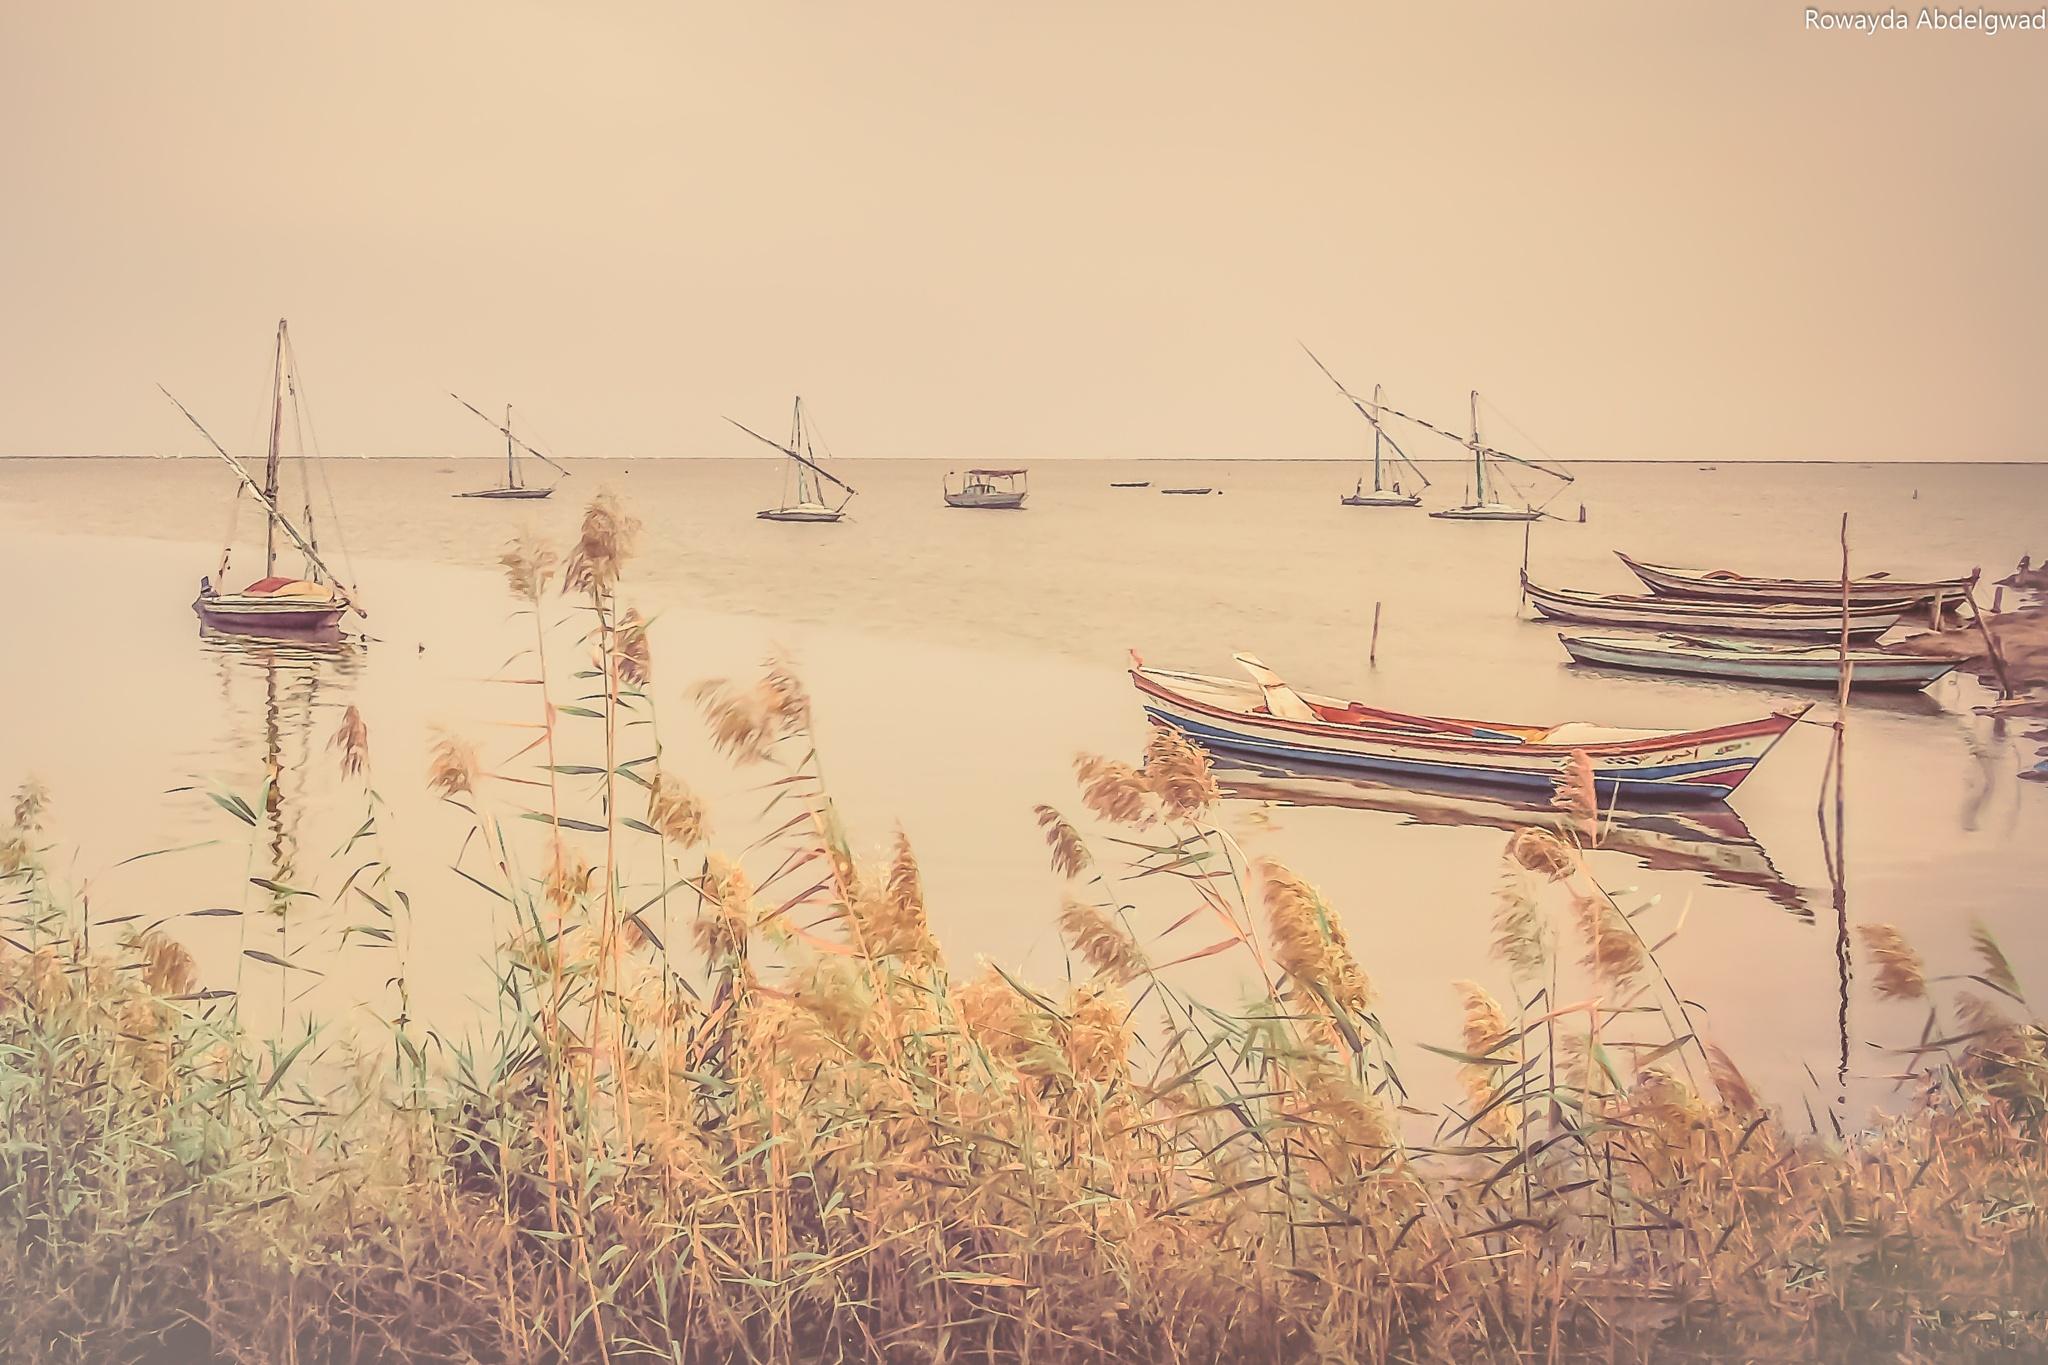 The magic of nature by Rowayda Abdelgwad